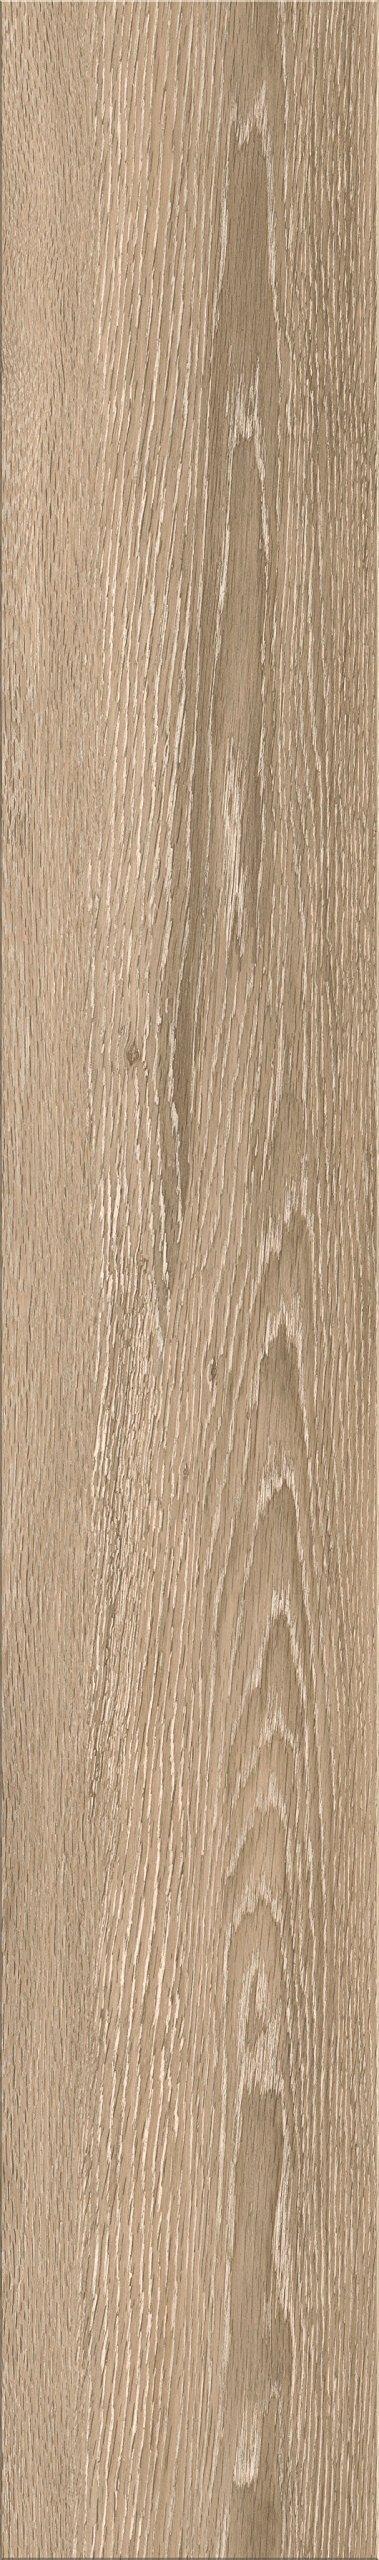 d'phlor 63503 Planks Interlocking Flooring, Weathered Wheat Field